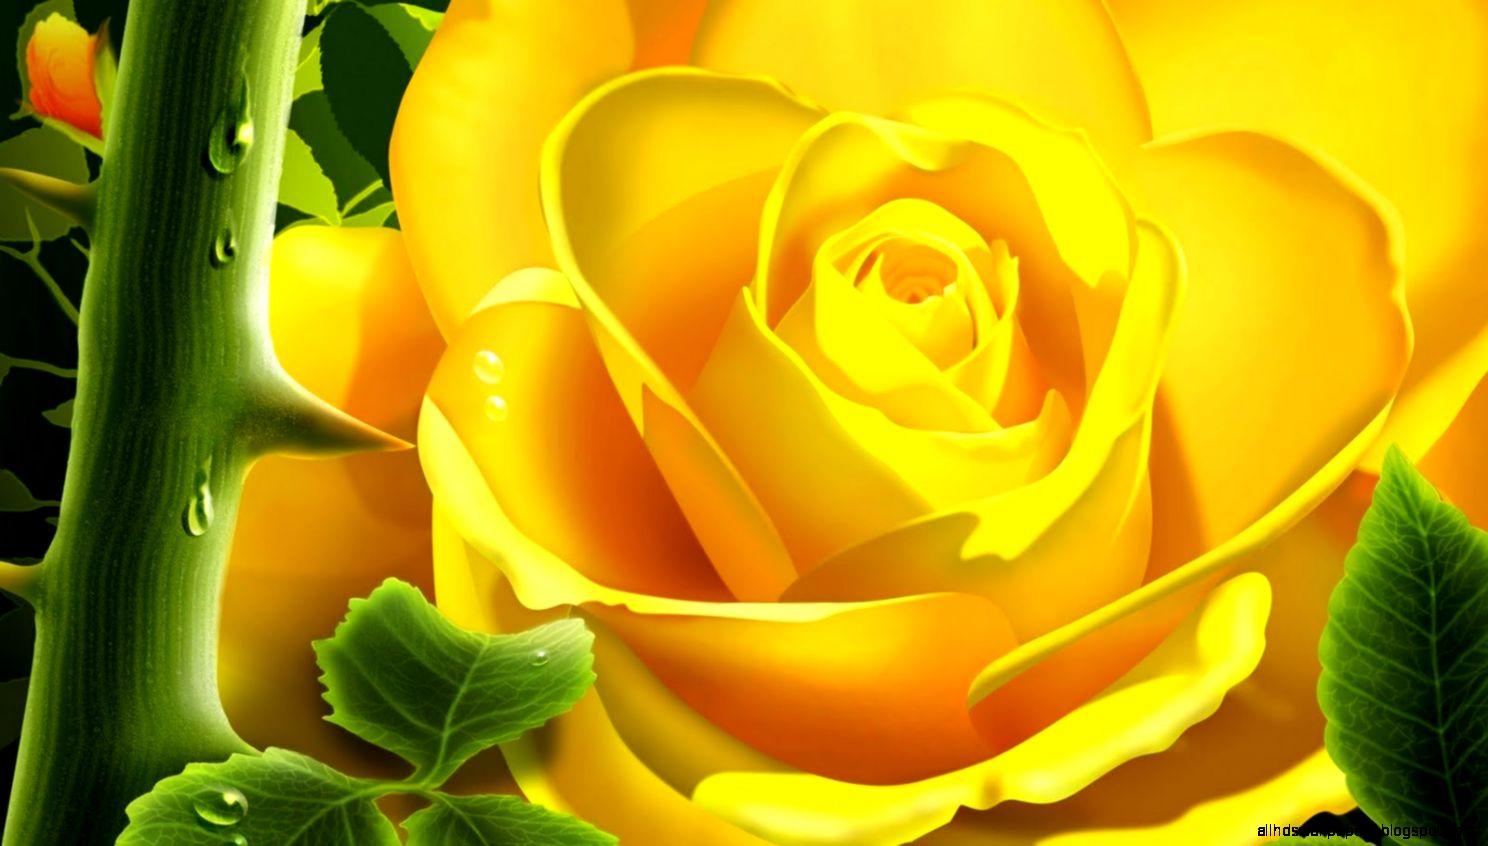 Blue yellow flower wallpaper hd 1080p all hd wallpapers view original size mightylinksfo